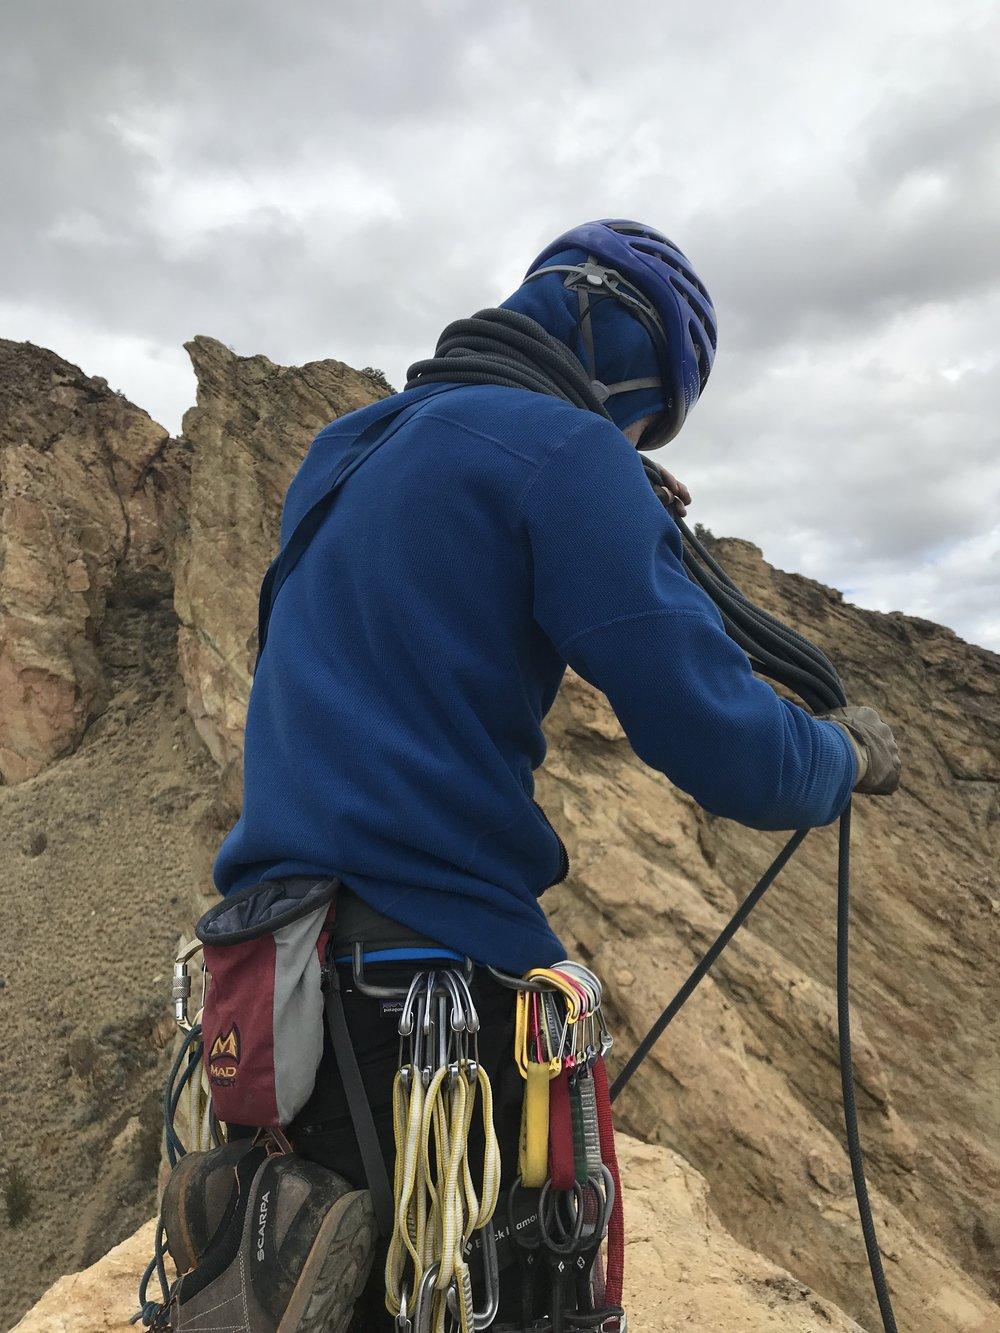 kyle Preparing for the rappel - Smith Rock, Oregon